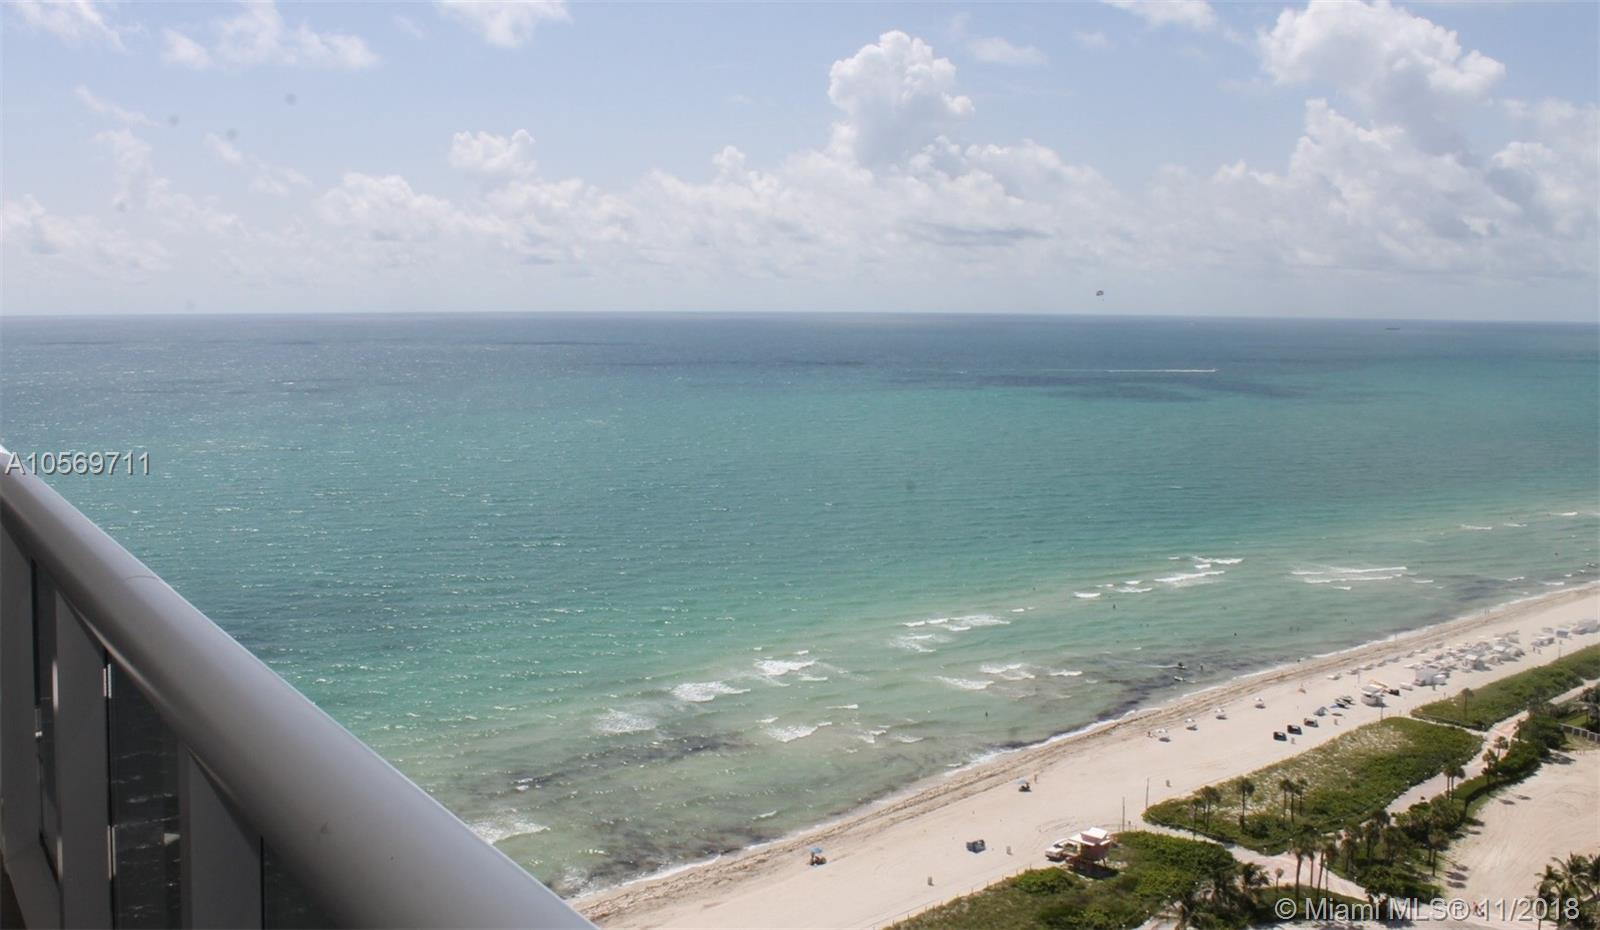 Green Diamond, 4775 Collins Ave Unit 2804, Miami Beach, Florida 33140